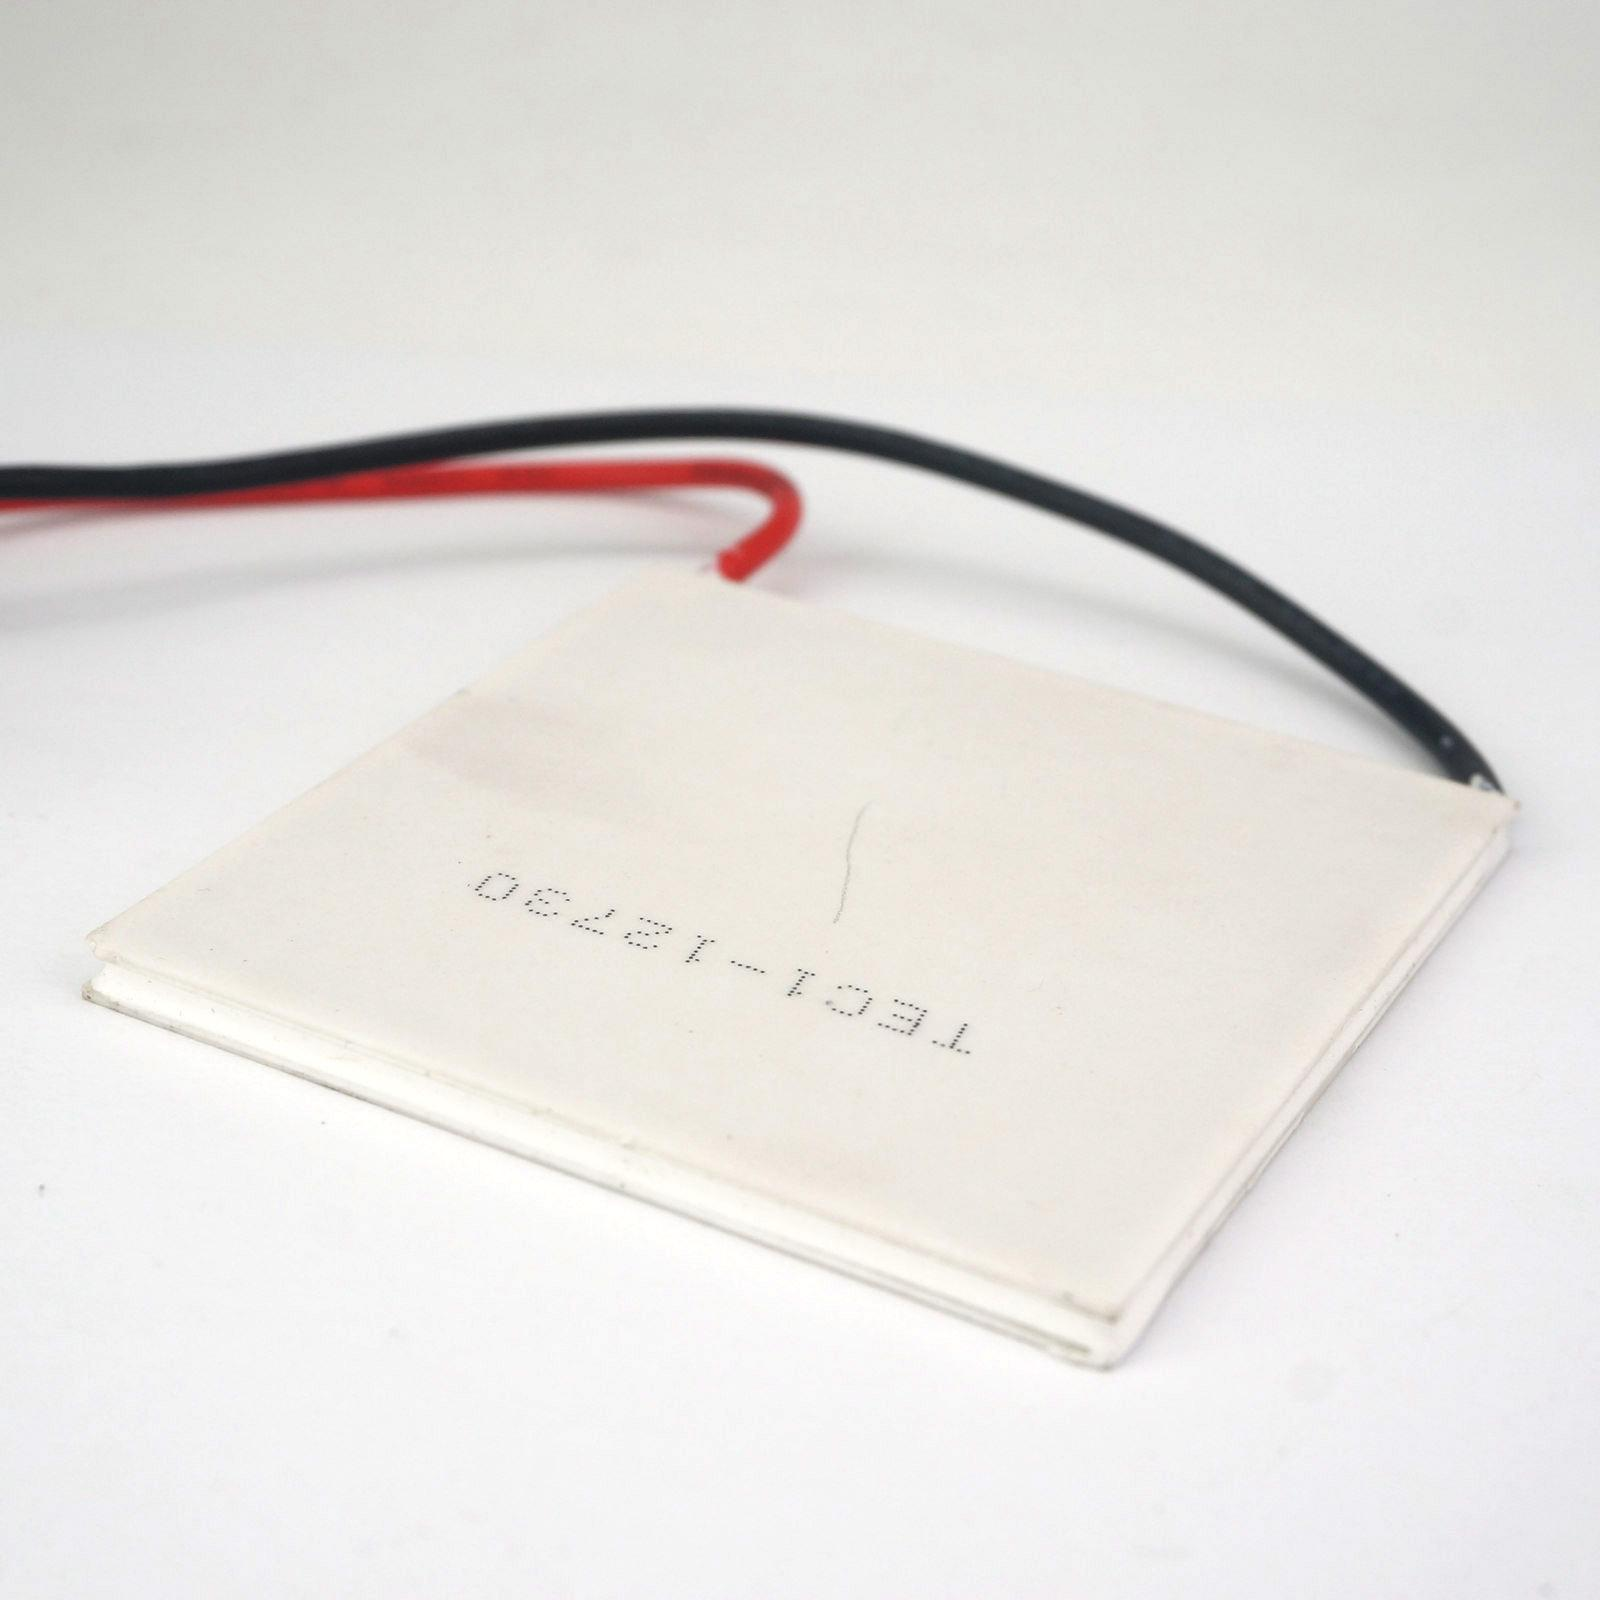 TEC1-12730 12V 253W Heatsink Thermoelectric Cooler Cooling Peltier Plate Module